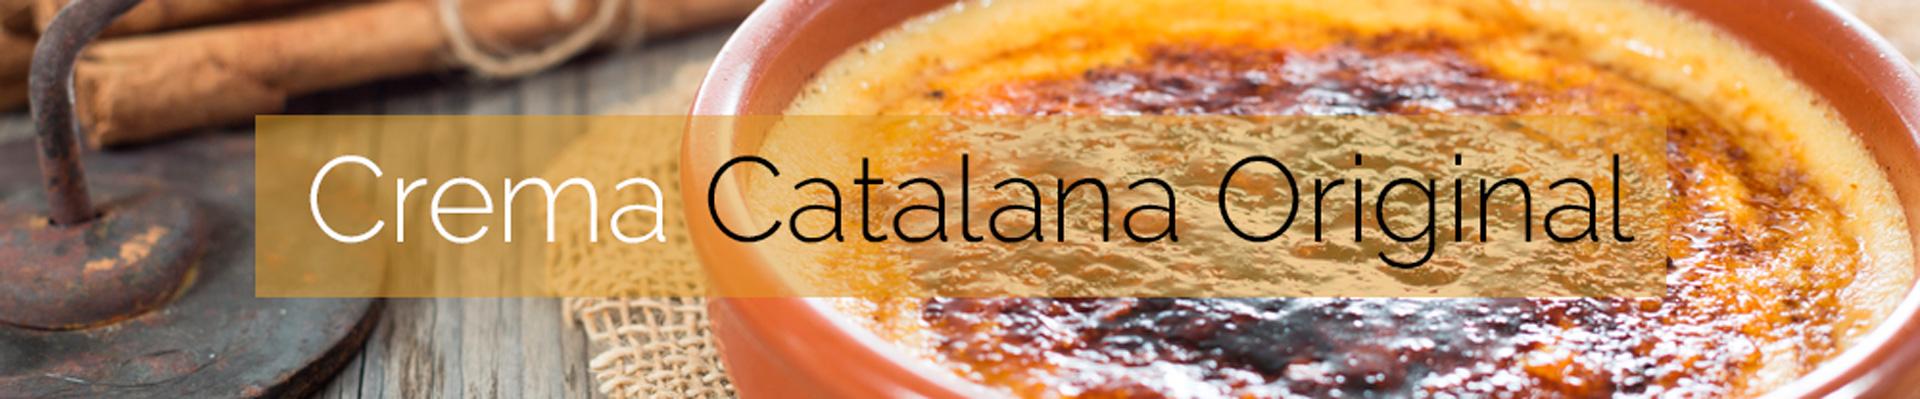 Crema Catalana Original